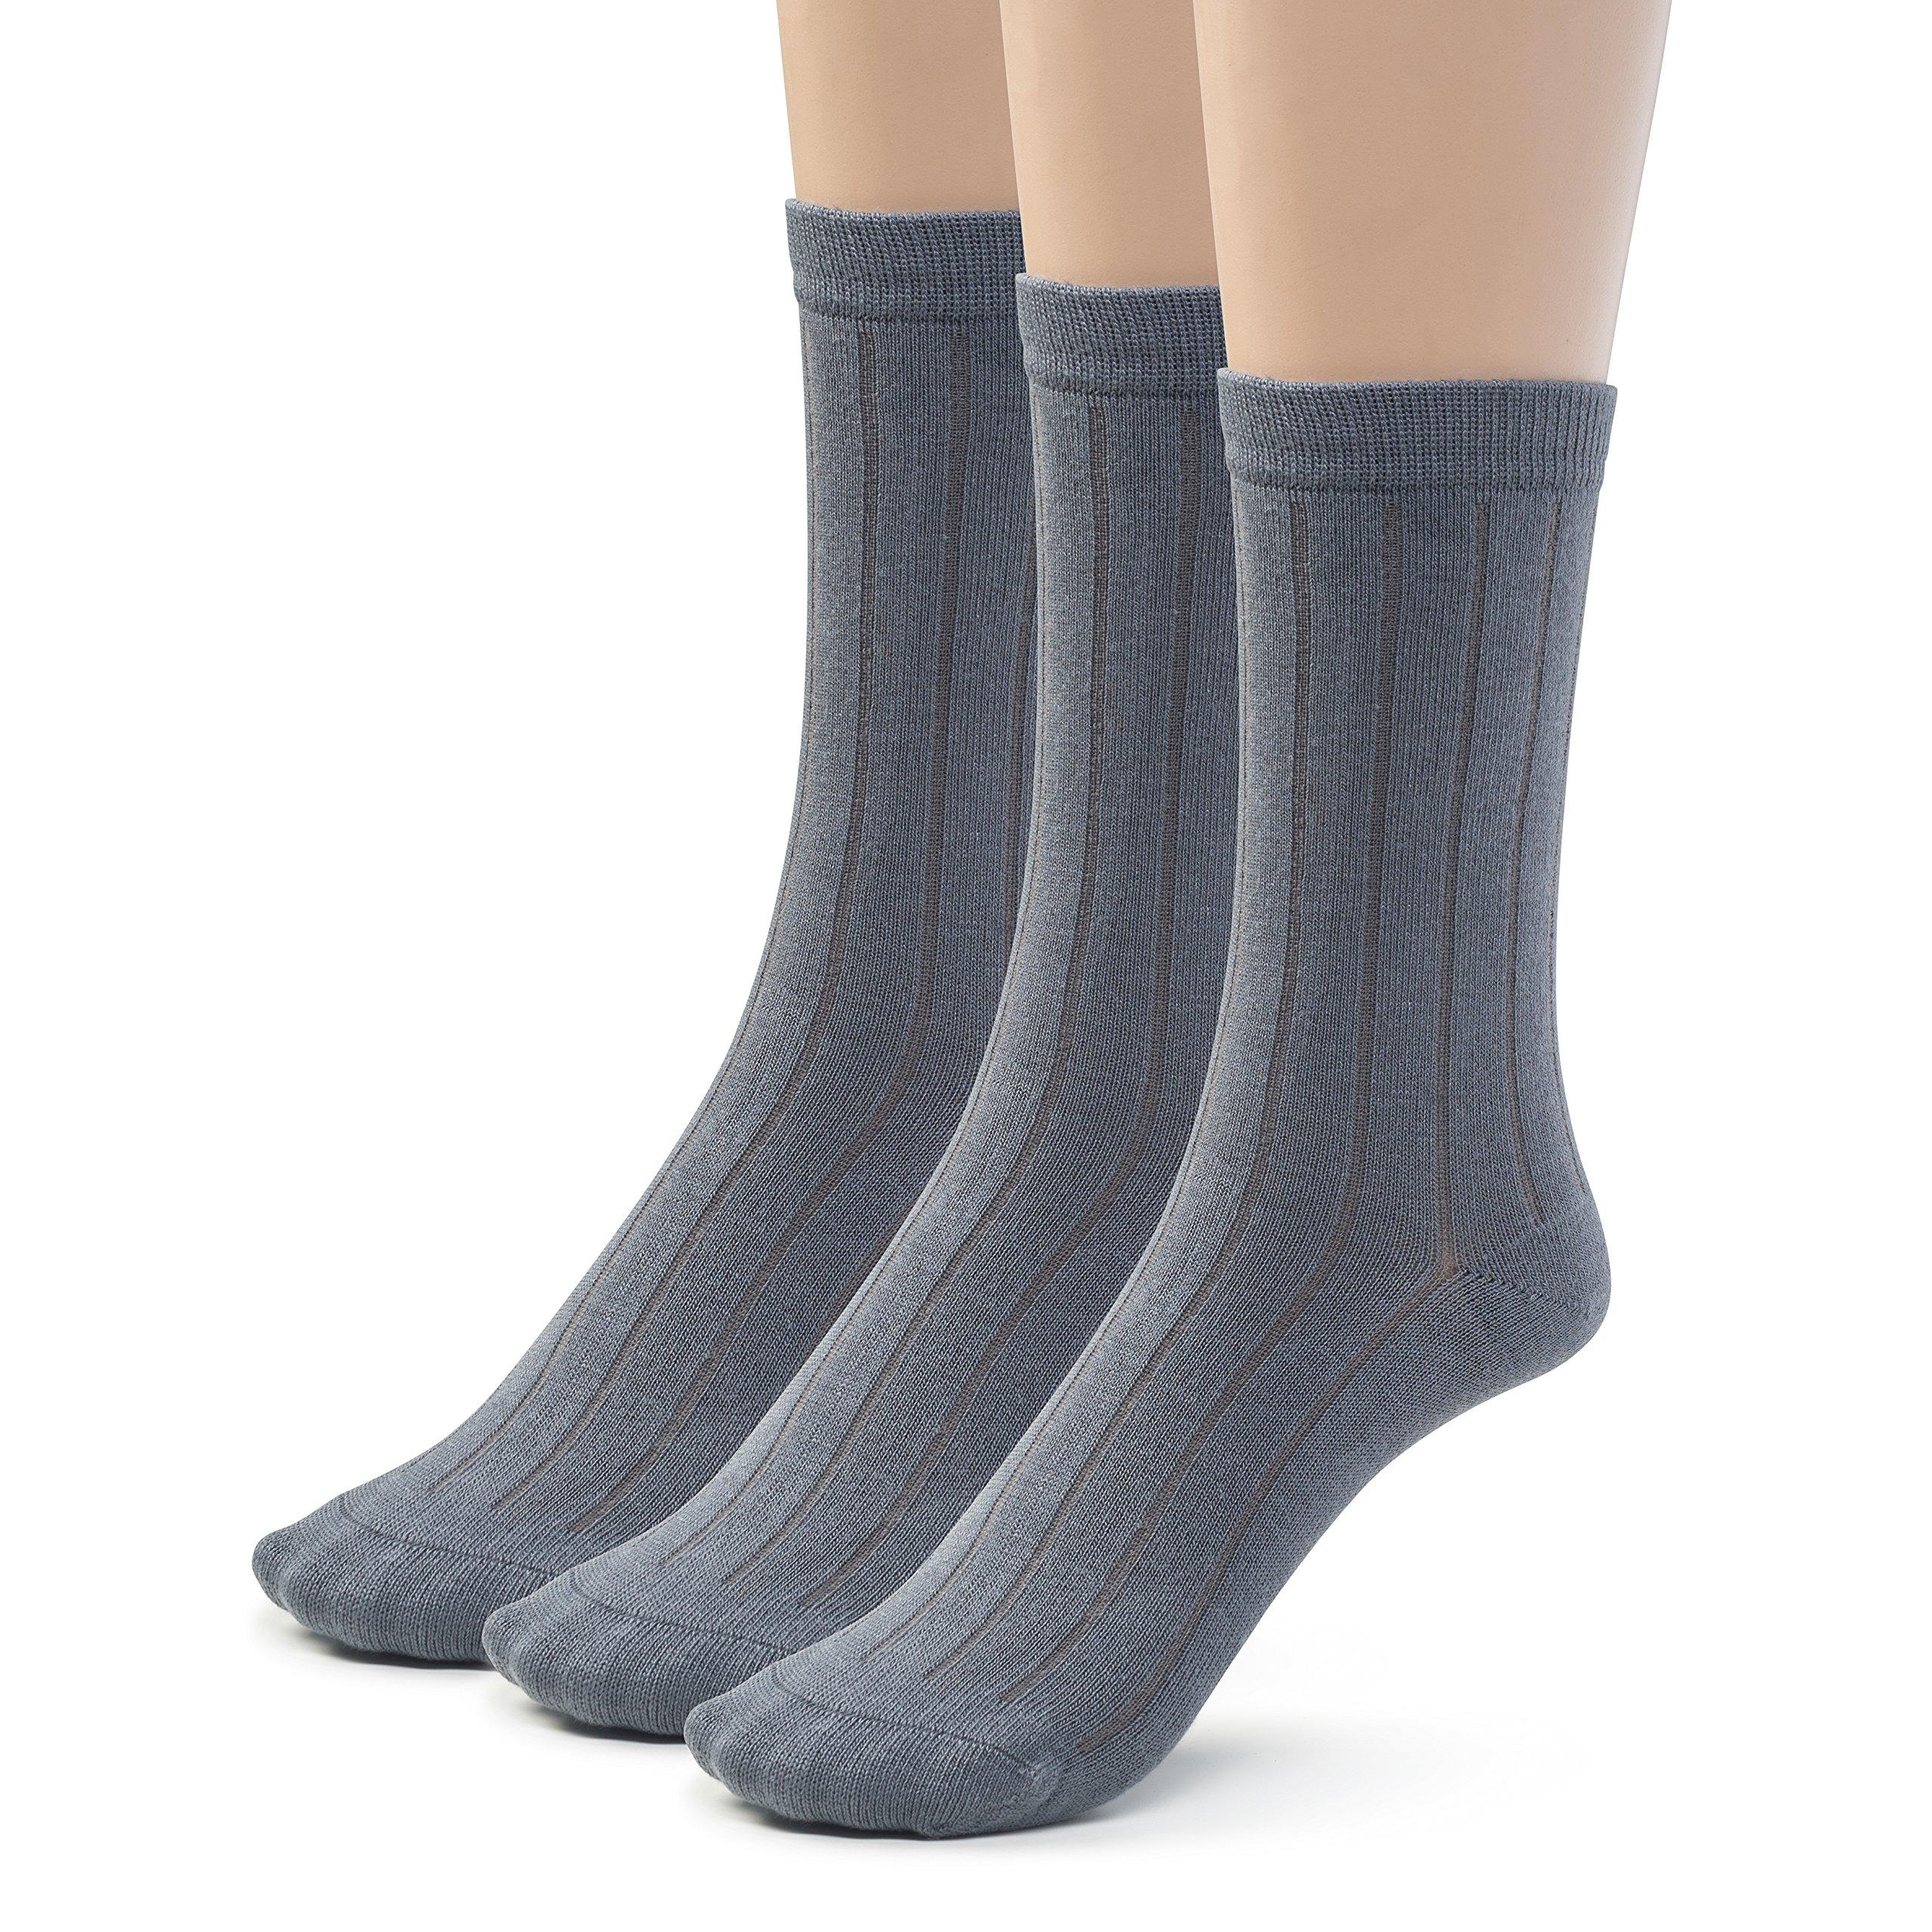 Silky Toes 3 Pairs Womens Bamboo Ribbed Dress Socks, Casual Basic Socks … (10-13, Heather Grey -3 Pairs)